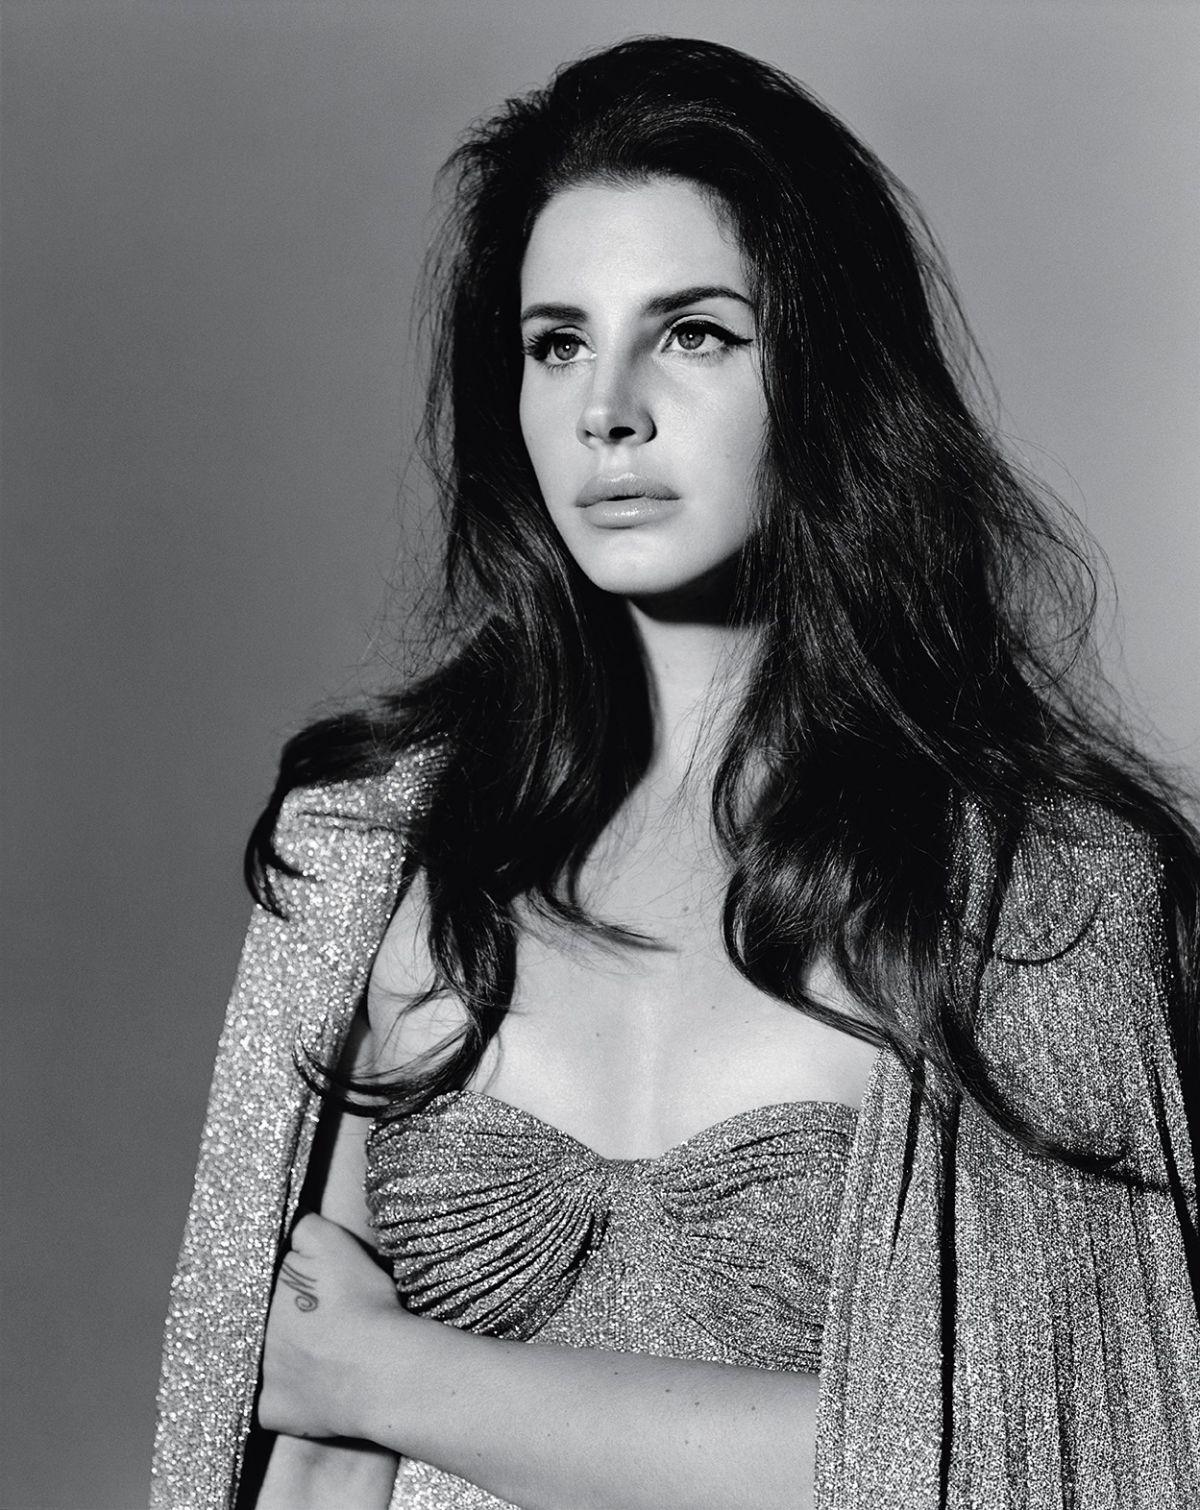 Lana Del Rey By Chris Nicholls For Fashion Magazine: Anothet Man Magazine Photoshoot By Alasdair